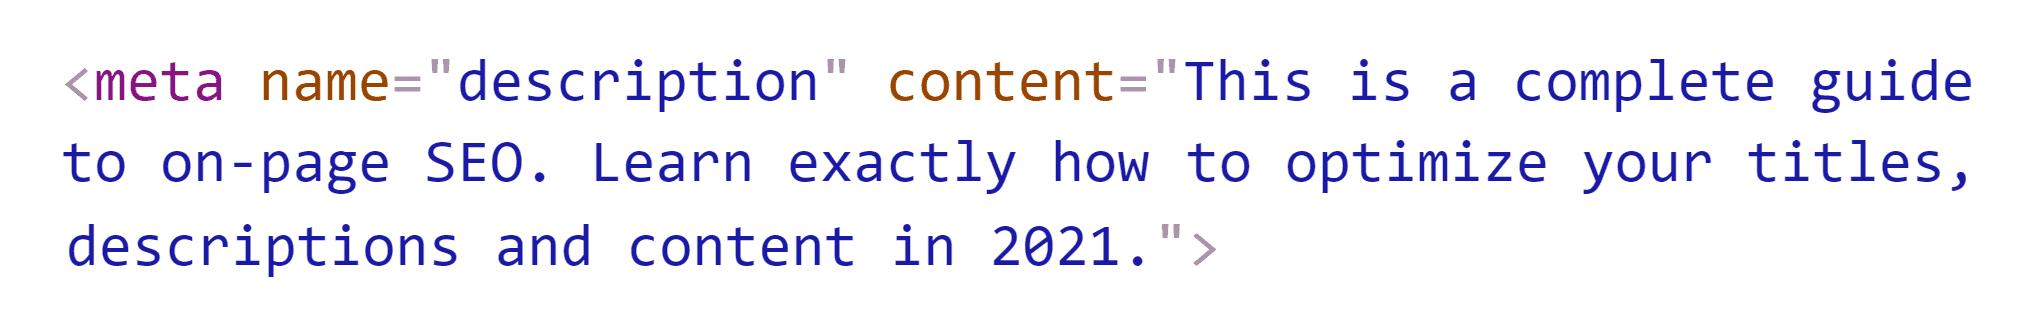 Post meta description